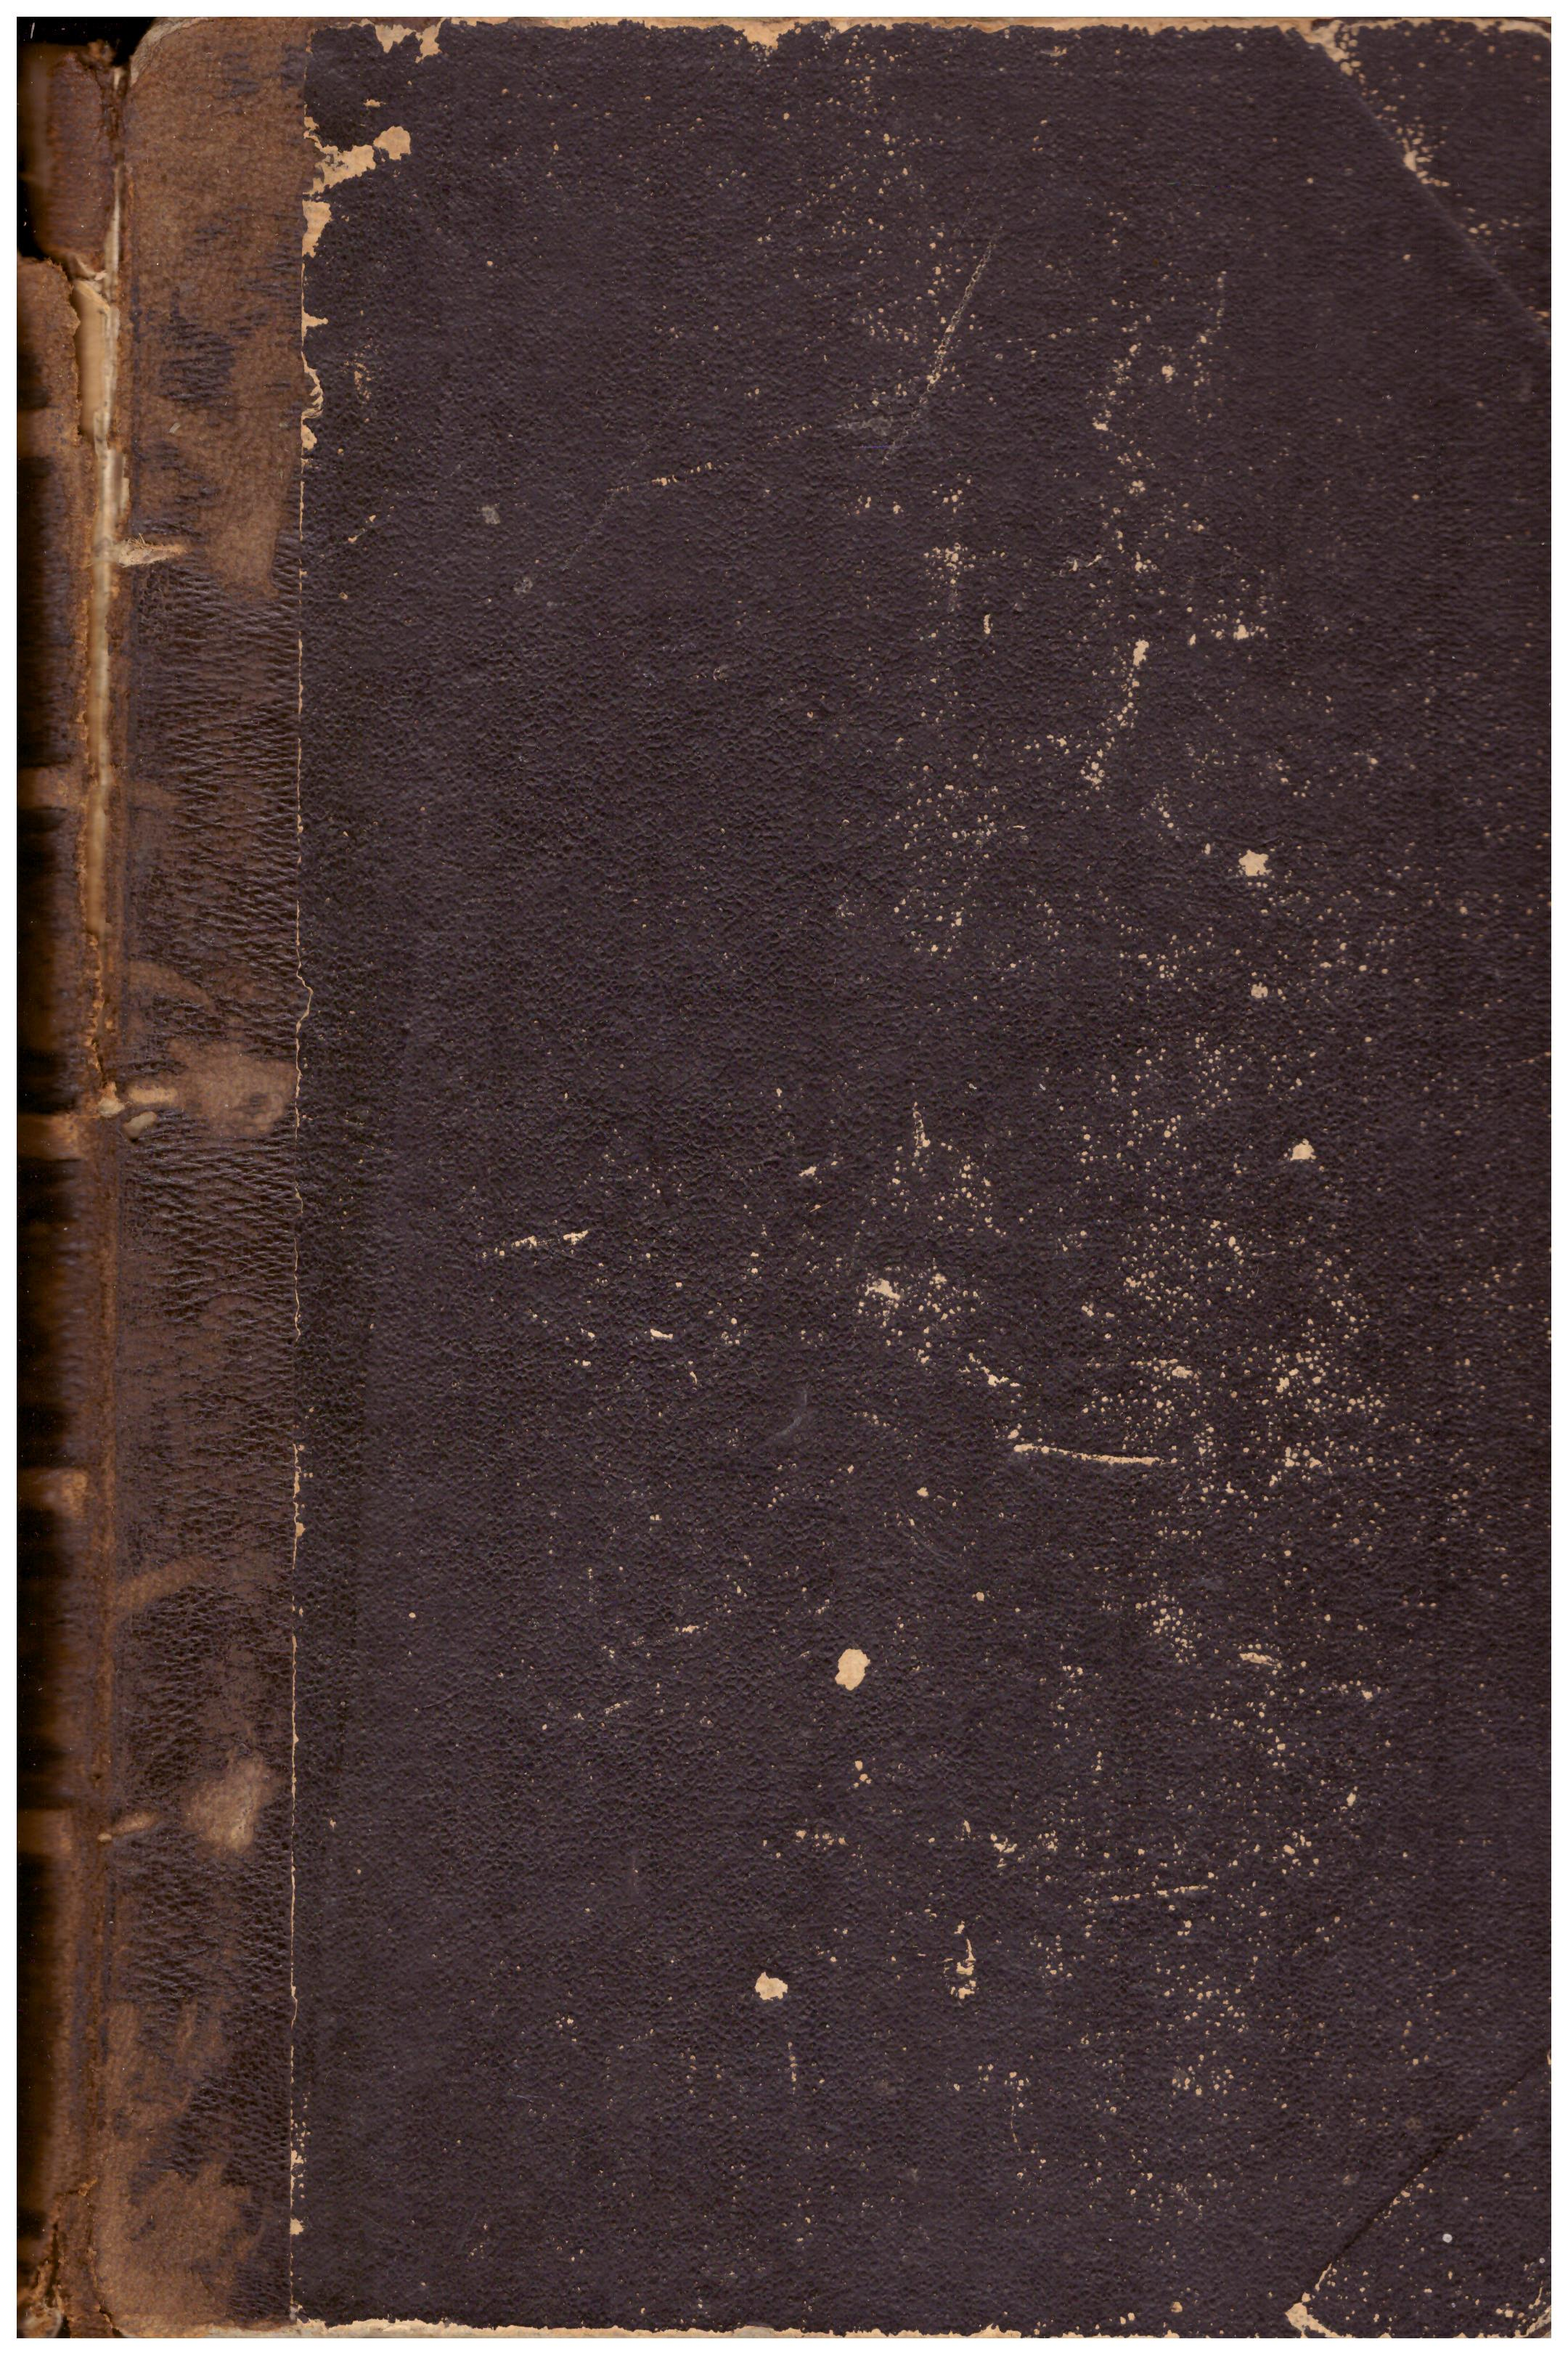 Titolo: L'ile mysterieuse  Autore: Jules Verne Editore: BIBLIOTHEQUE D'EDUCATION ED DE RECREATION, Paris 1865